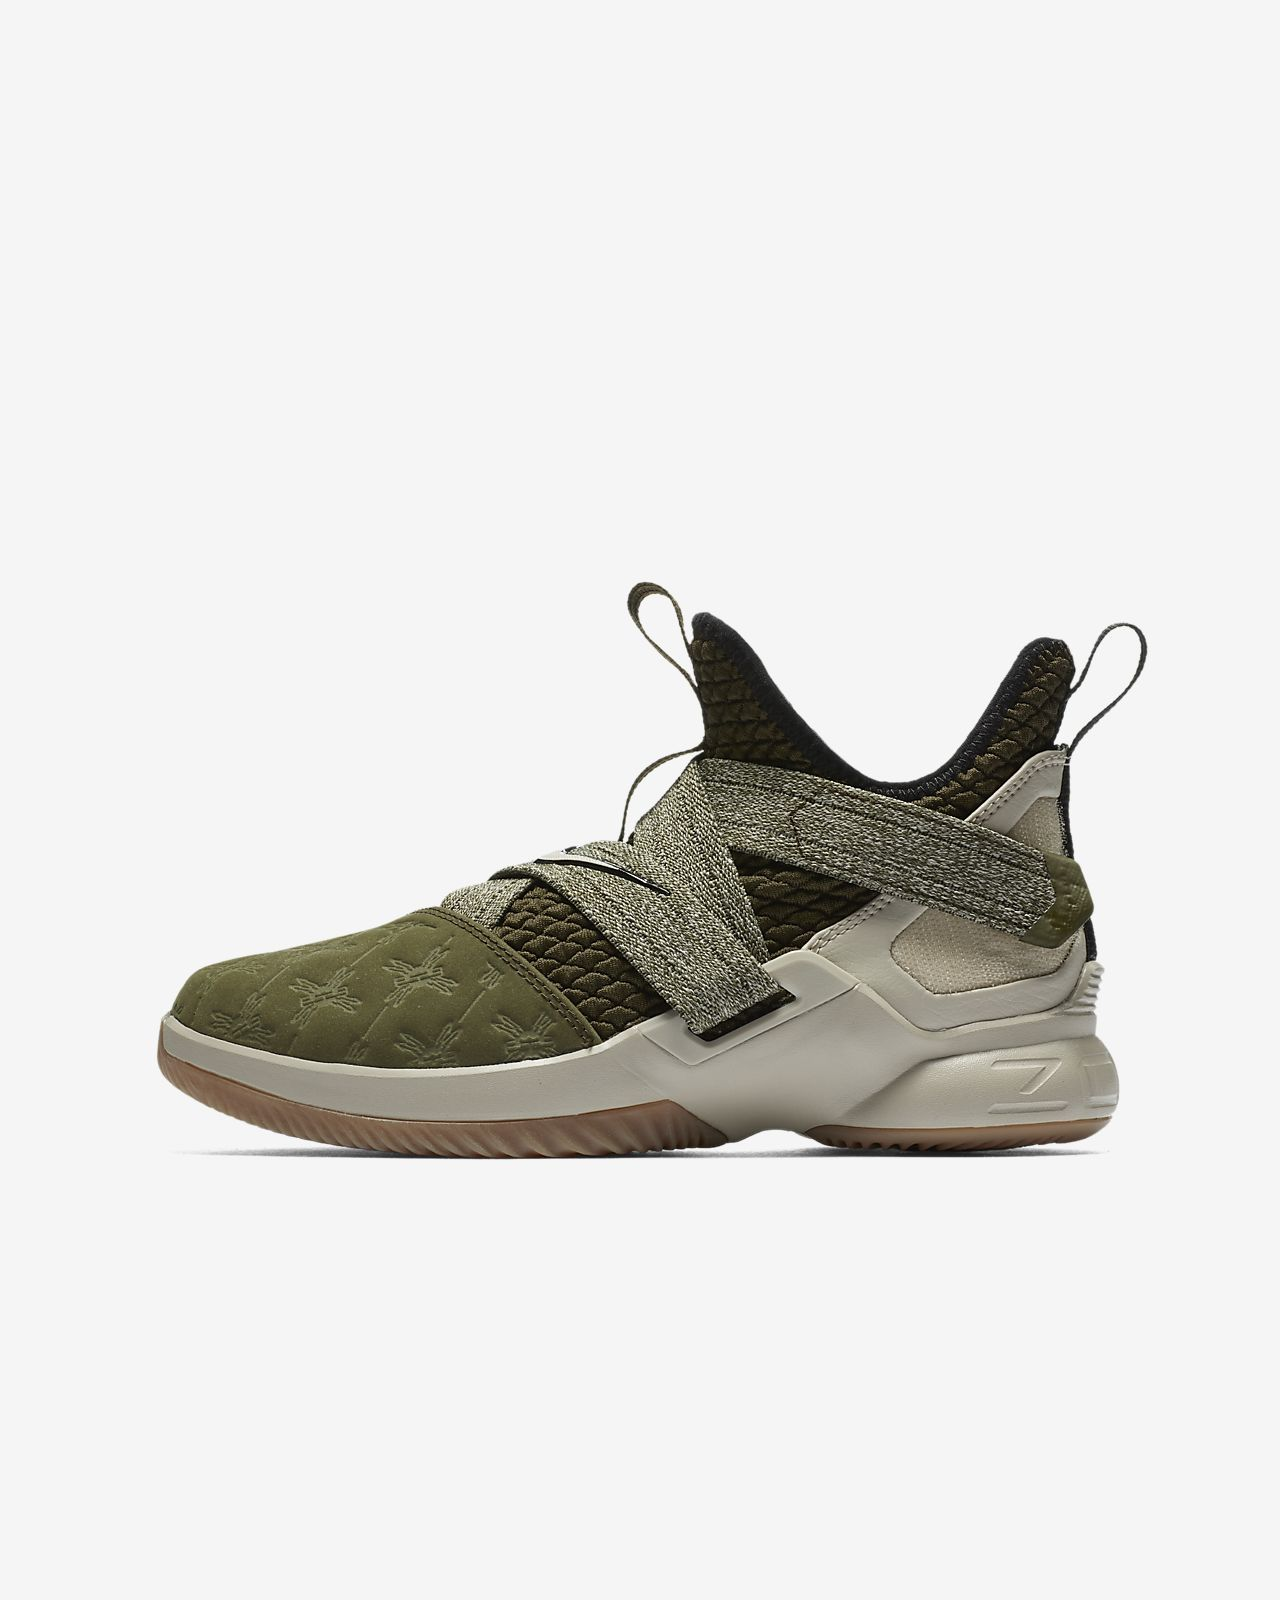 d39a8b54c4eb LeBron Soldier XII Big Kids  Basketball Shoe